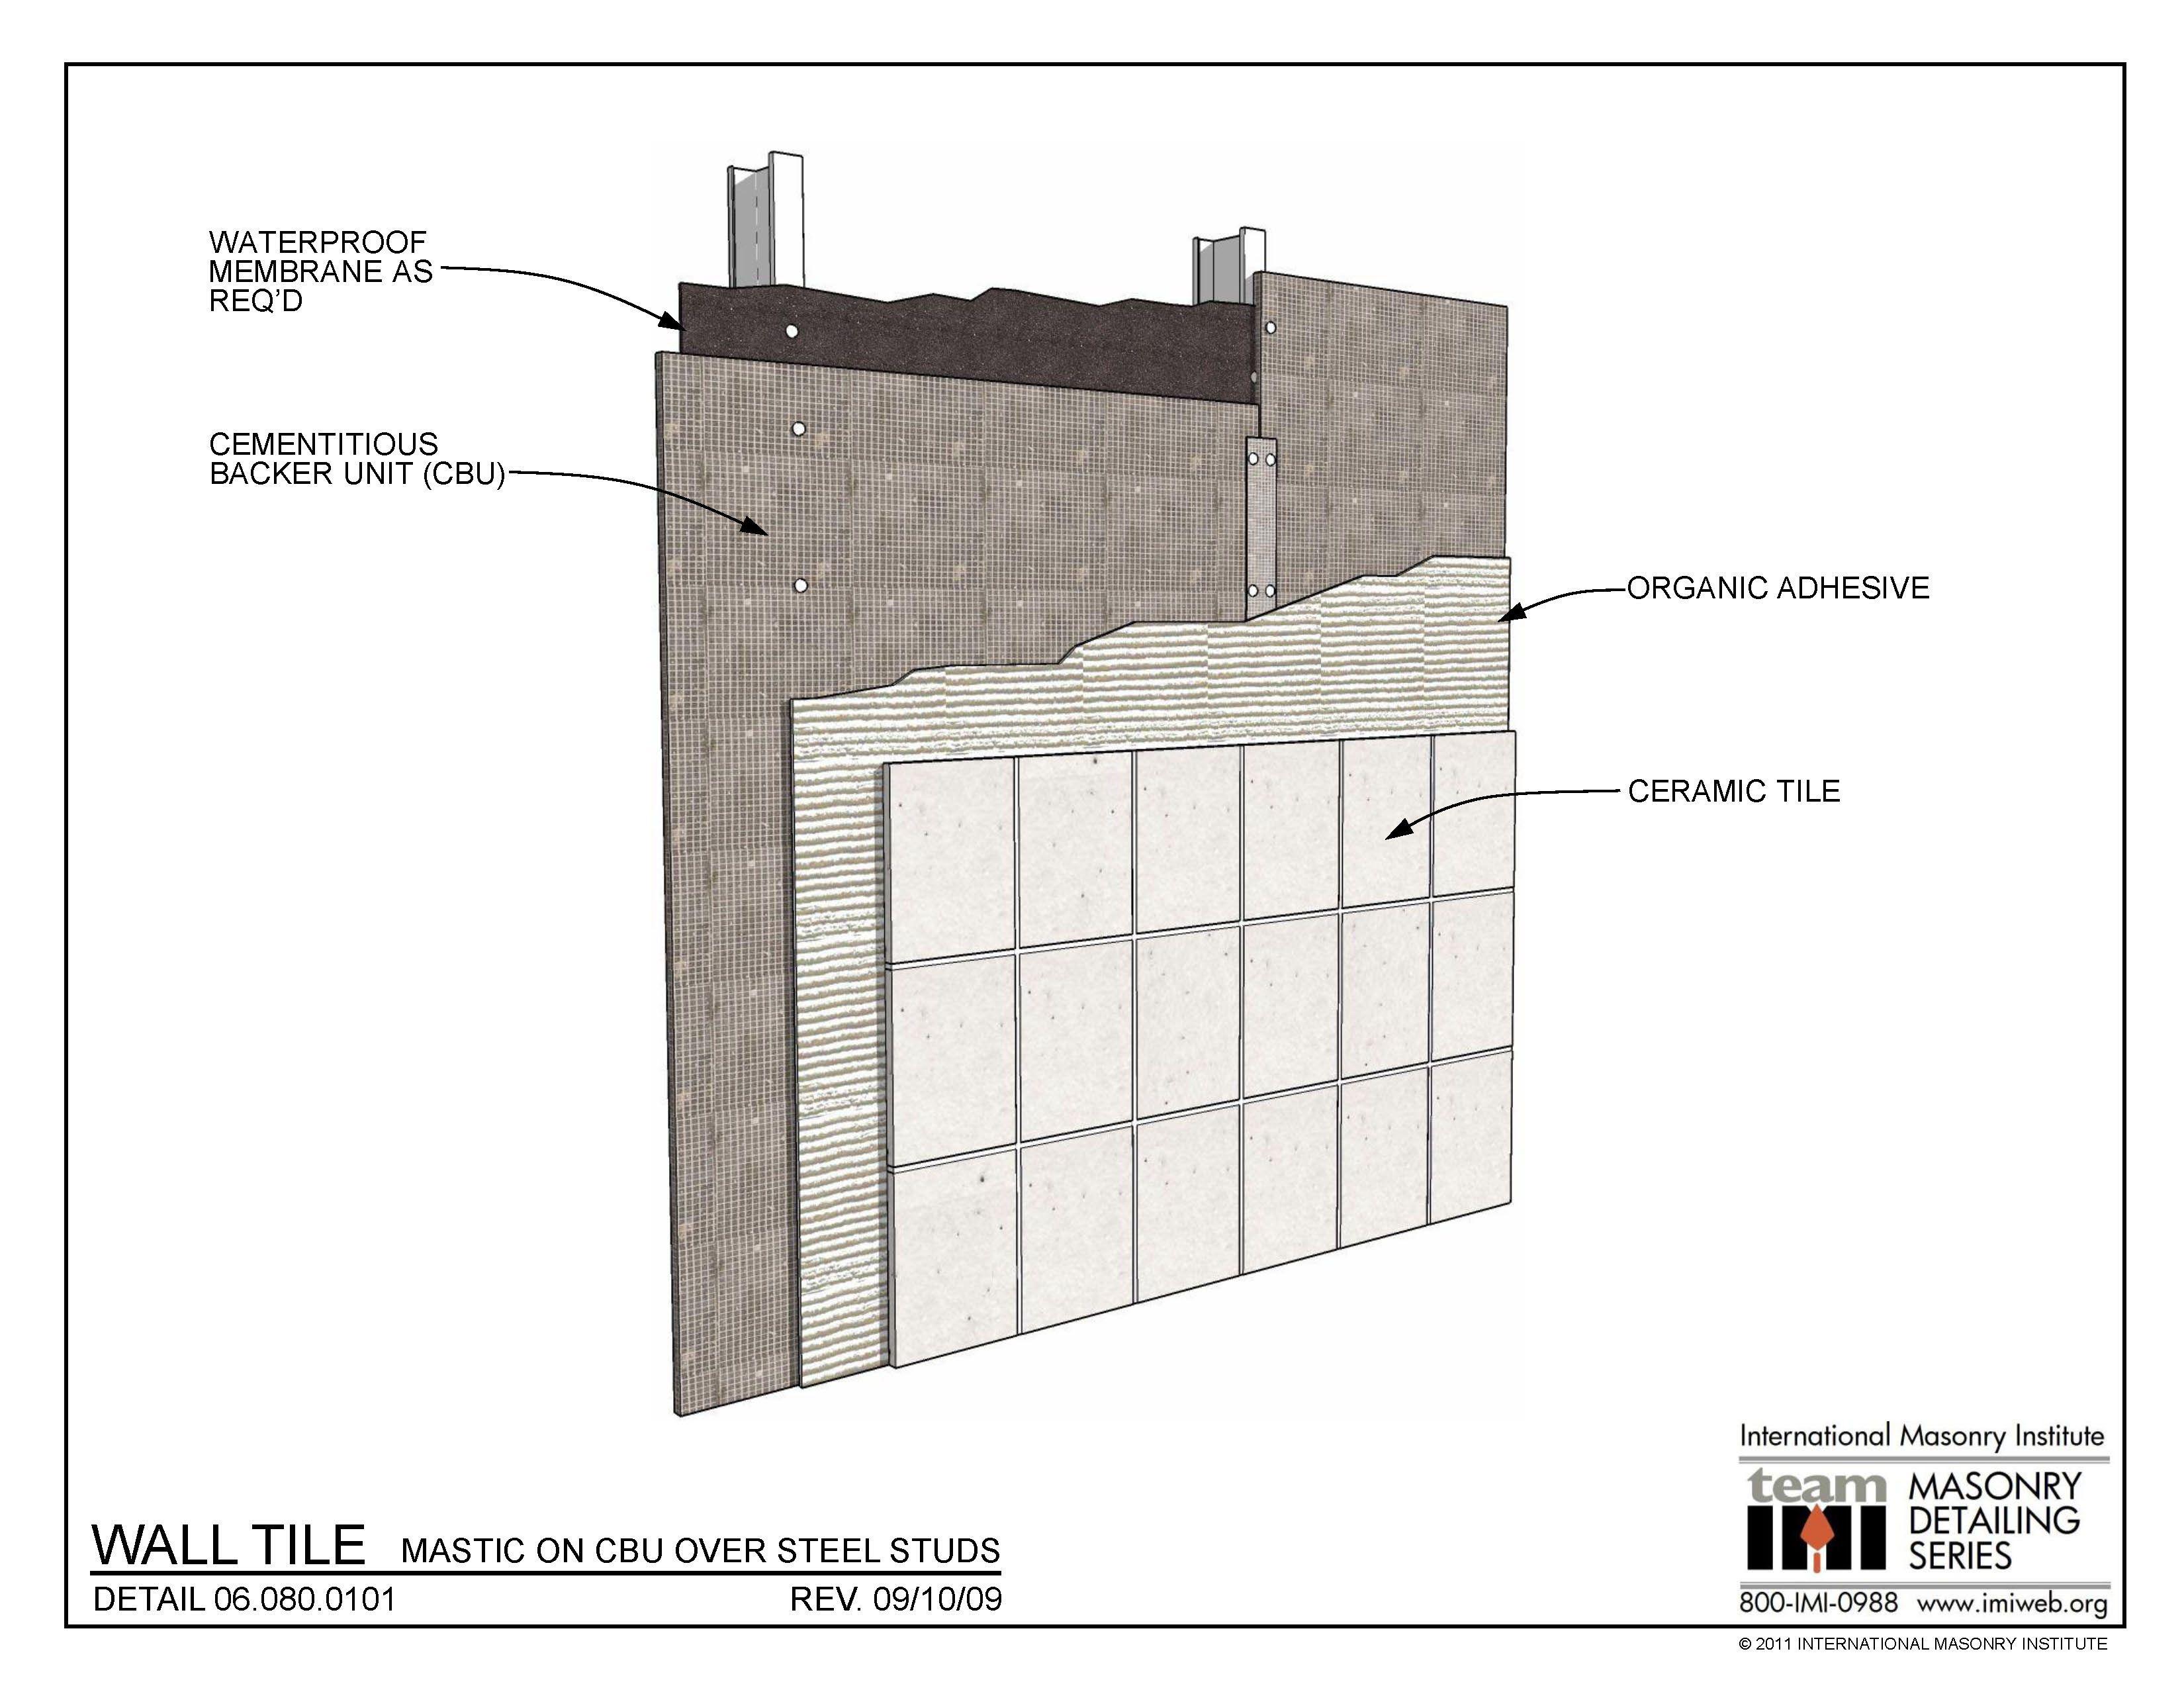 Pin by Jessie Mclain on Building Technology Studio | Pinterest ...